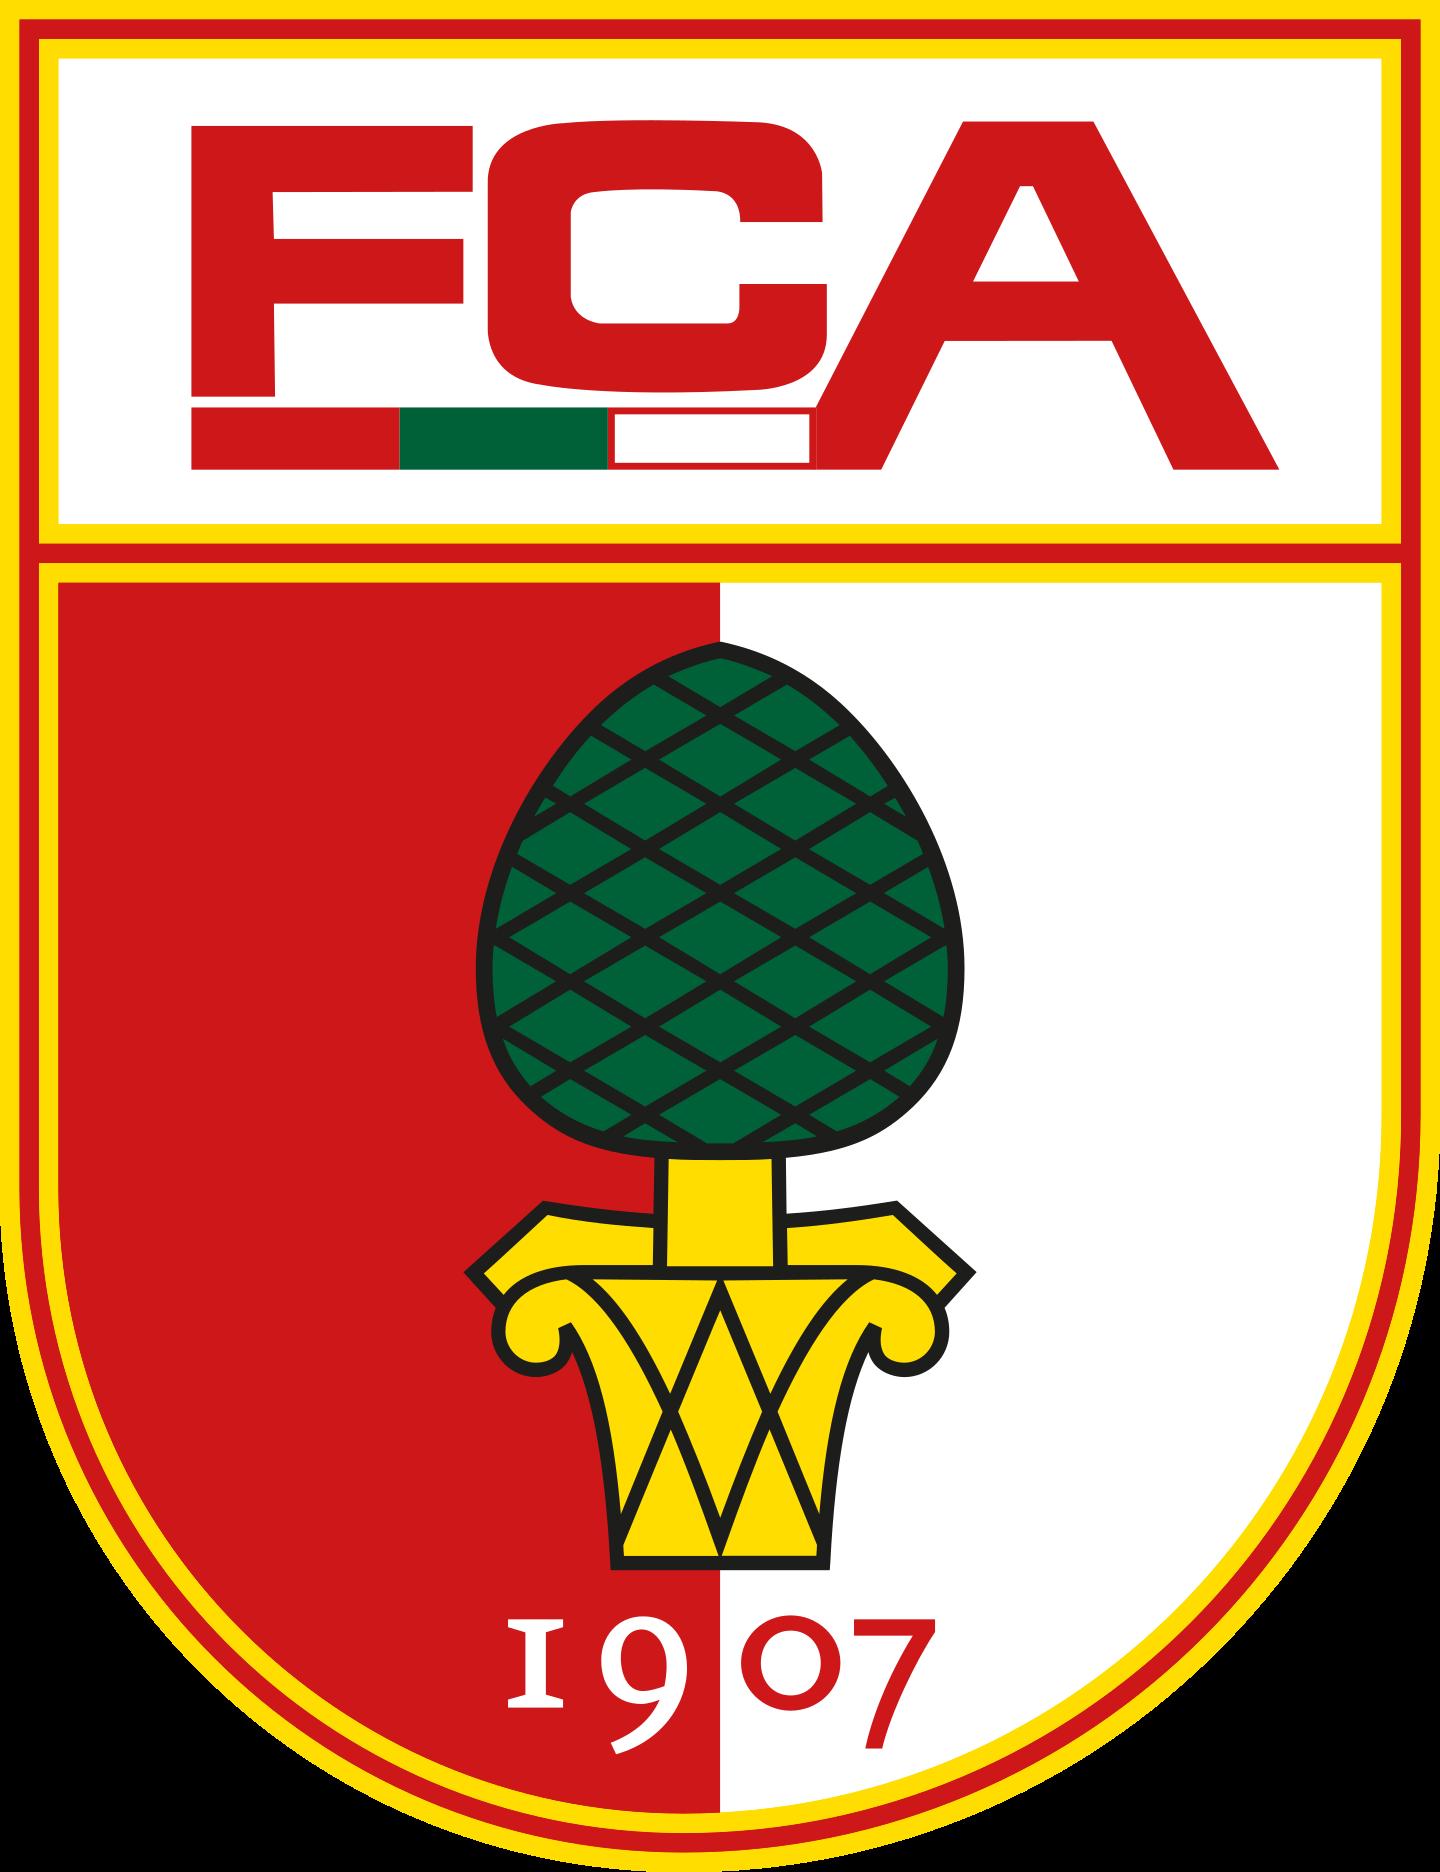 fc augsburg logo 2 - FC Augsburg Logo